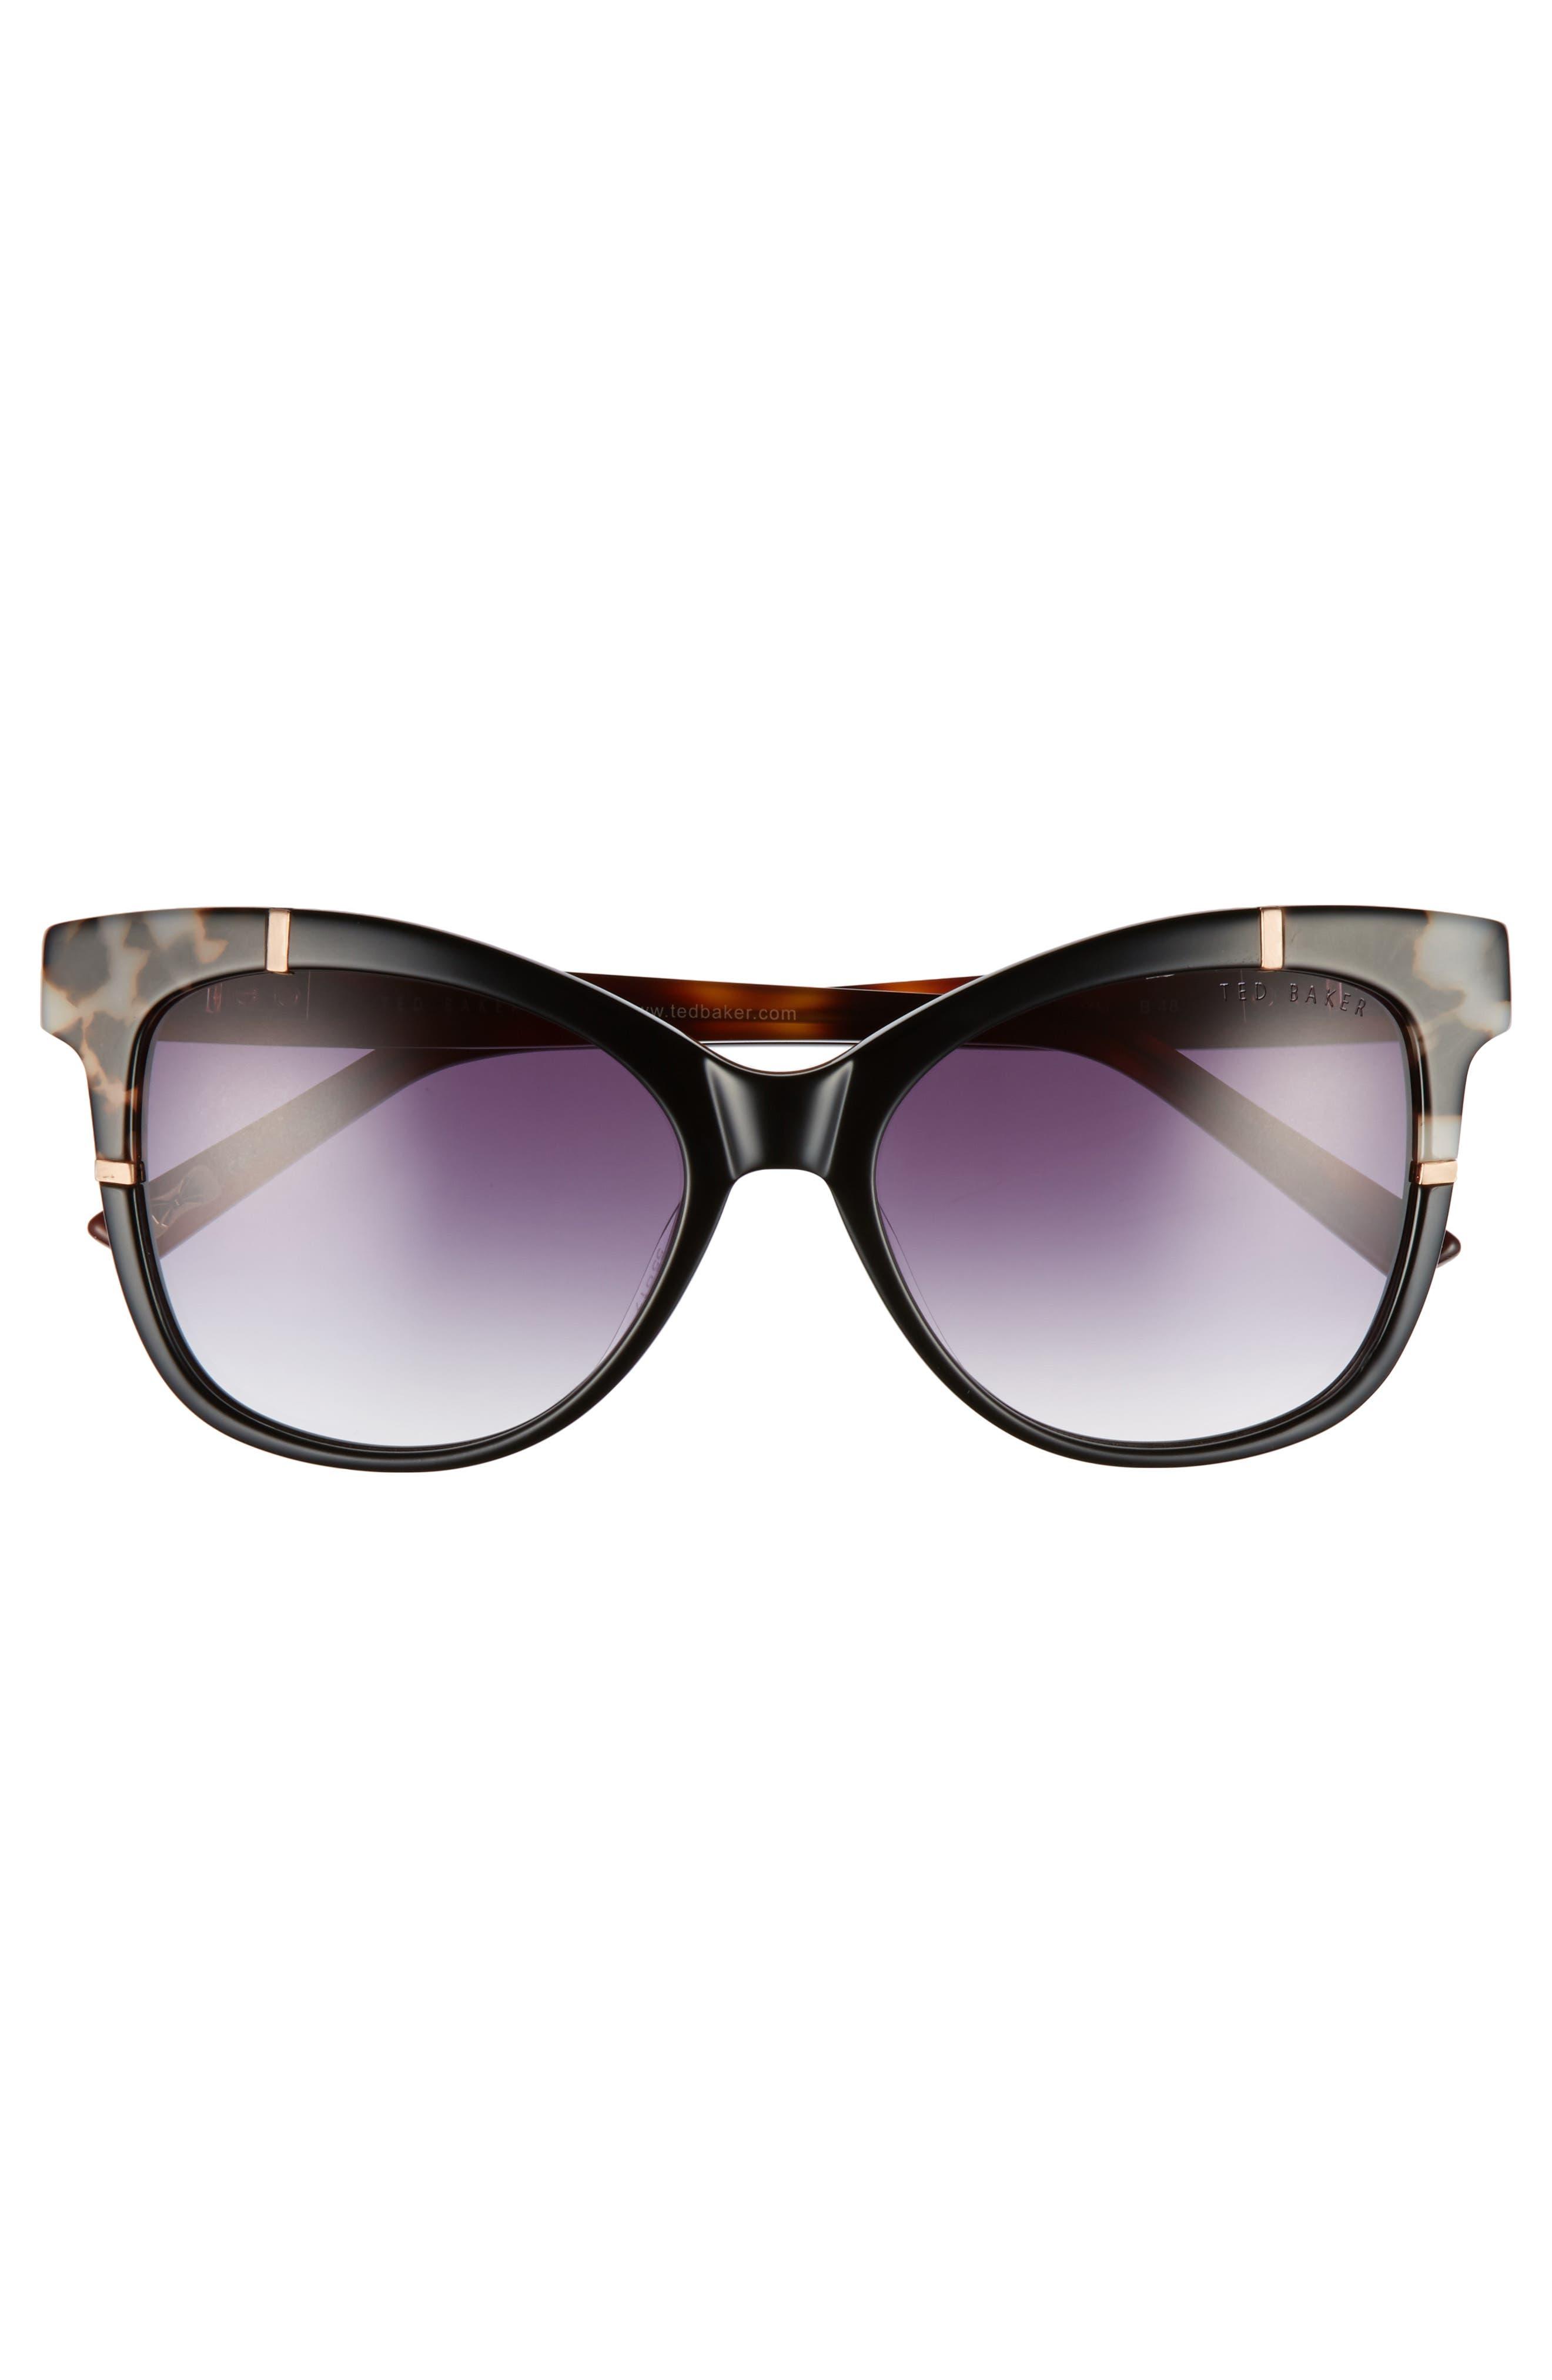 55mm Square Cat Eye Sunglasses,                             Alternate thumbnail 3, color,                             001